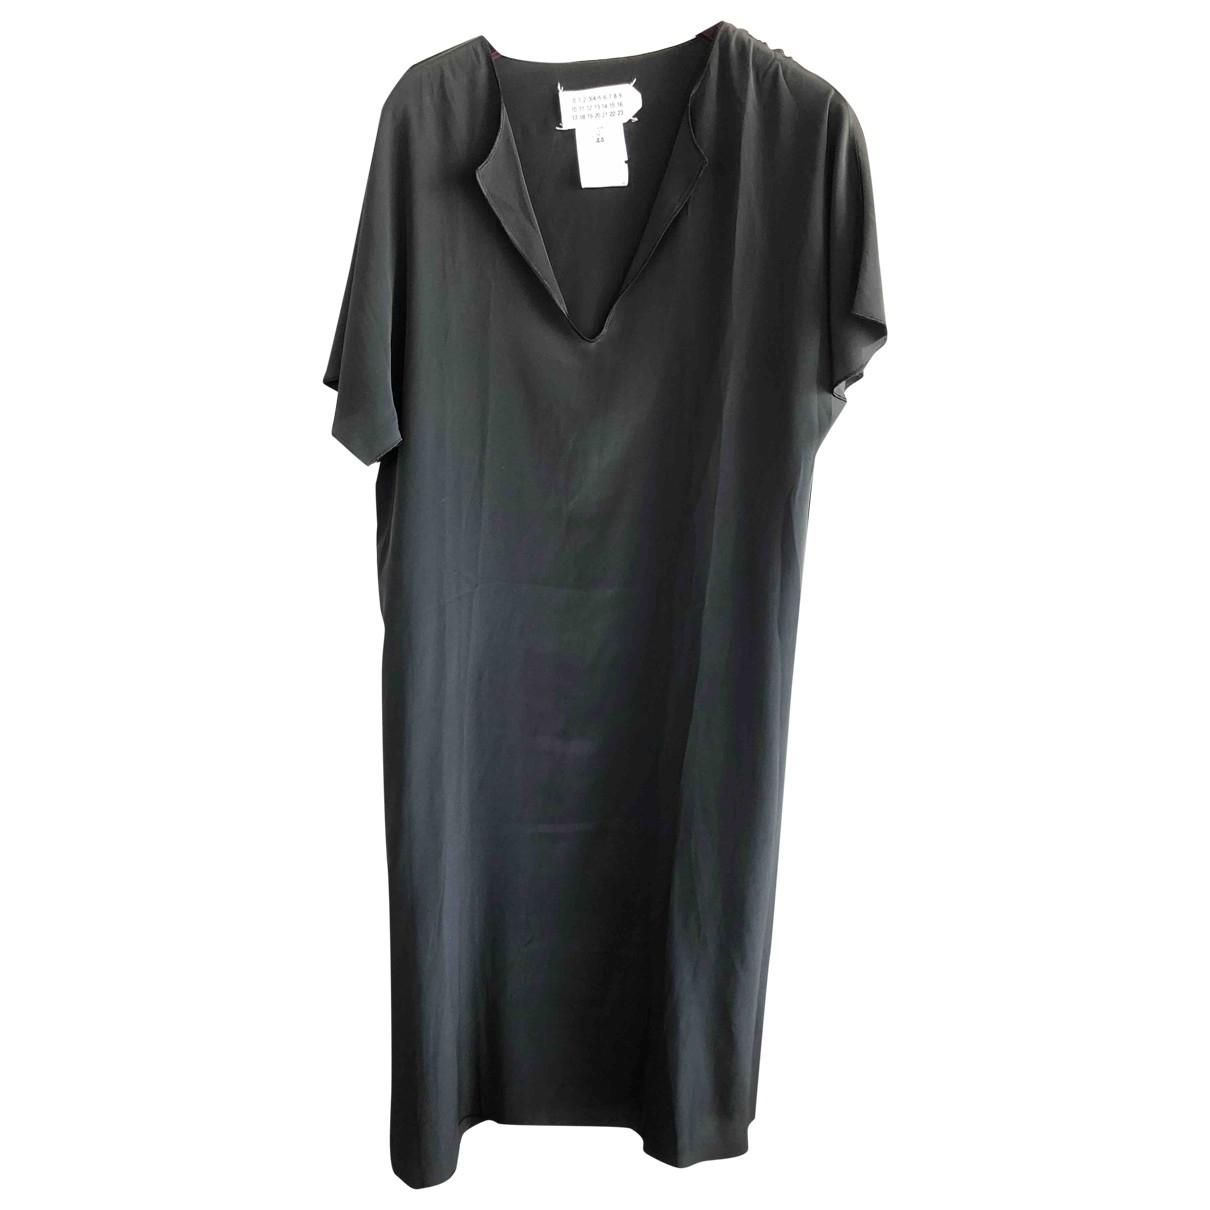 Maison Martin Margiela \N Kleid in  Schwarz Synthetik